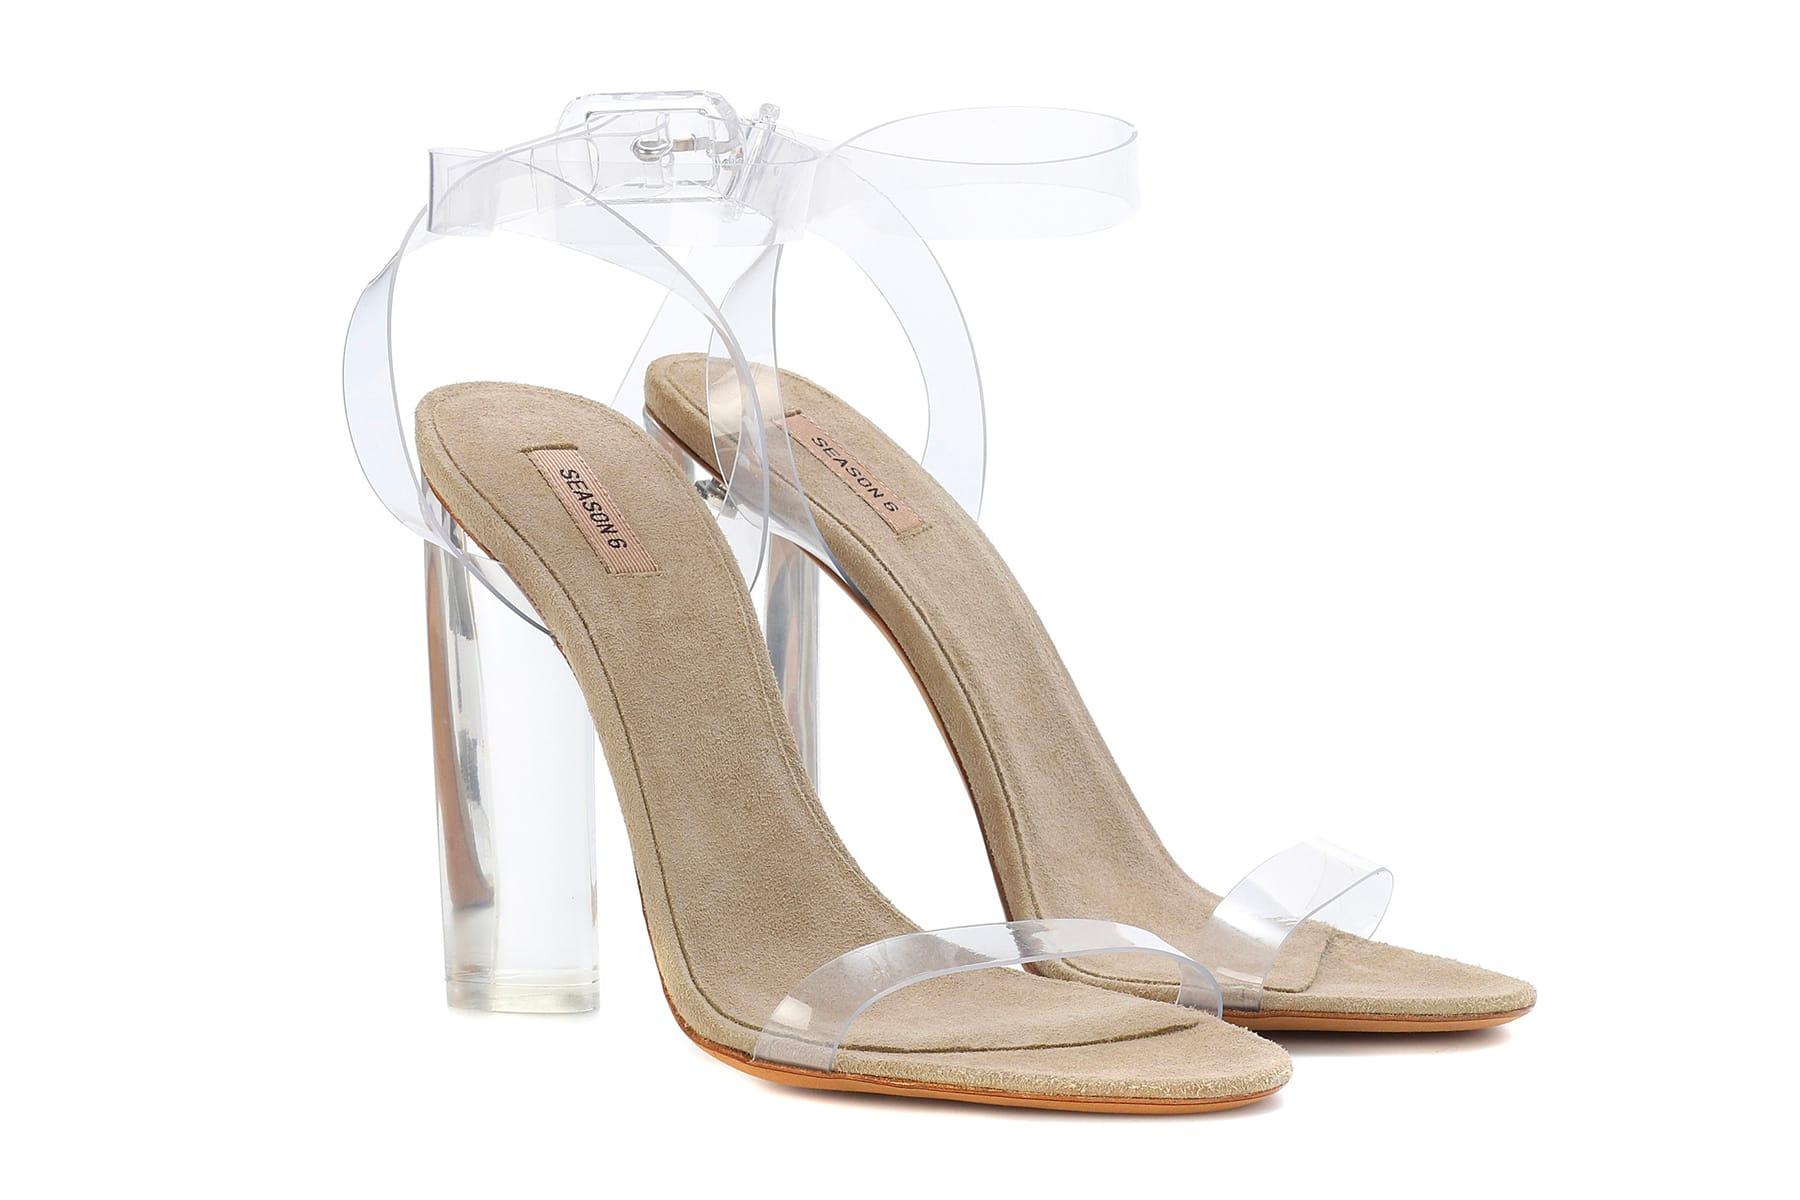 YEEZY Season 6 Transparent Sandals